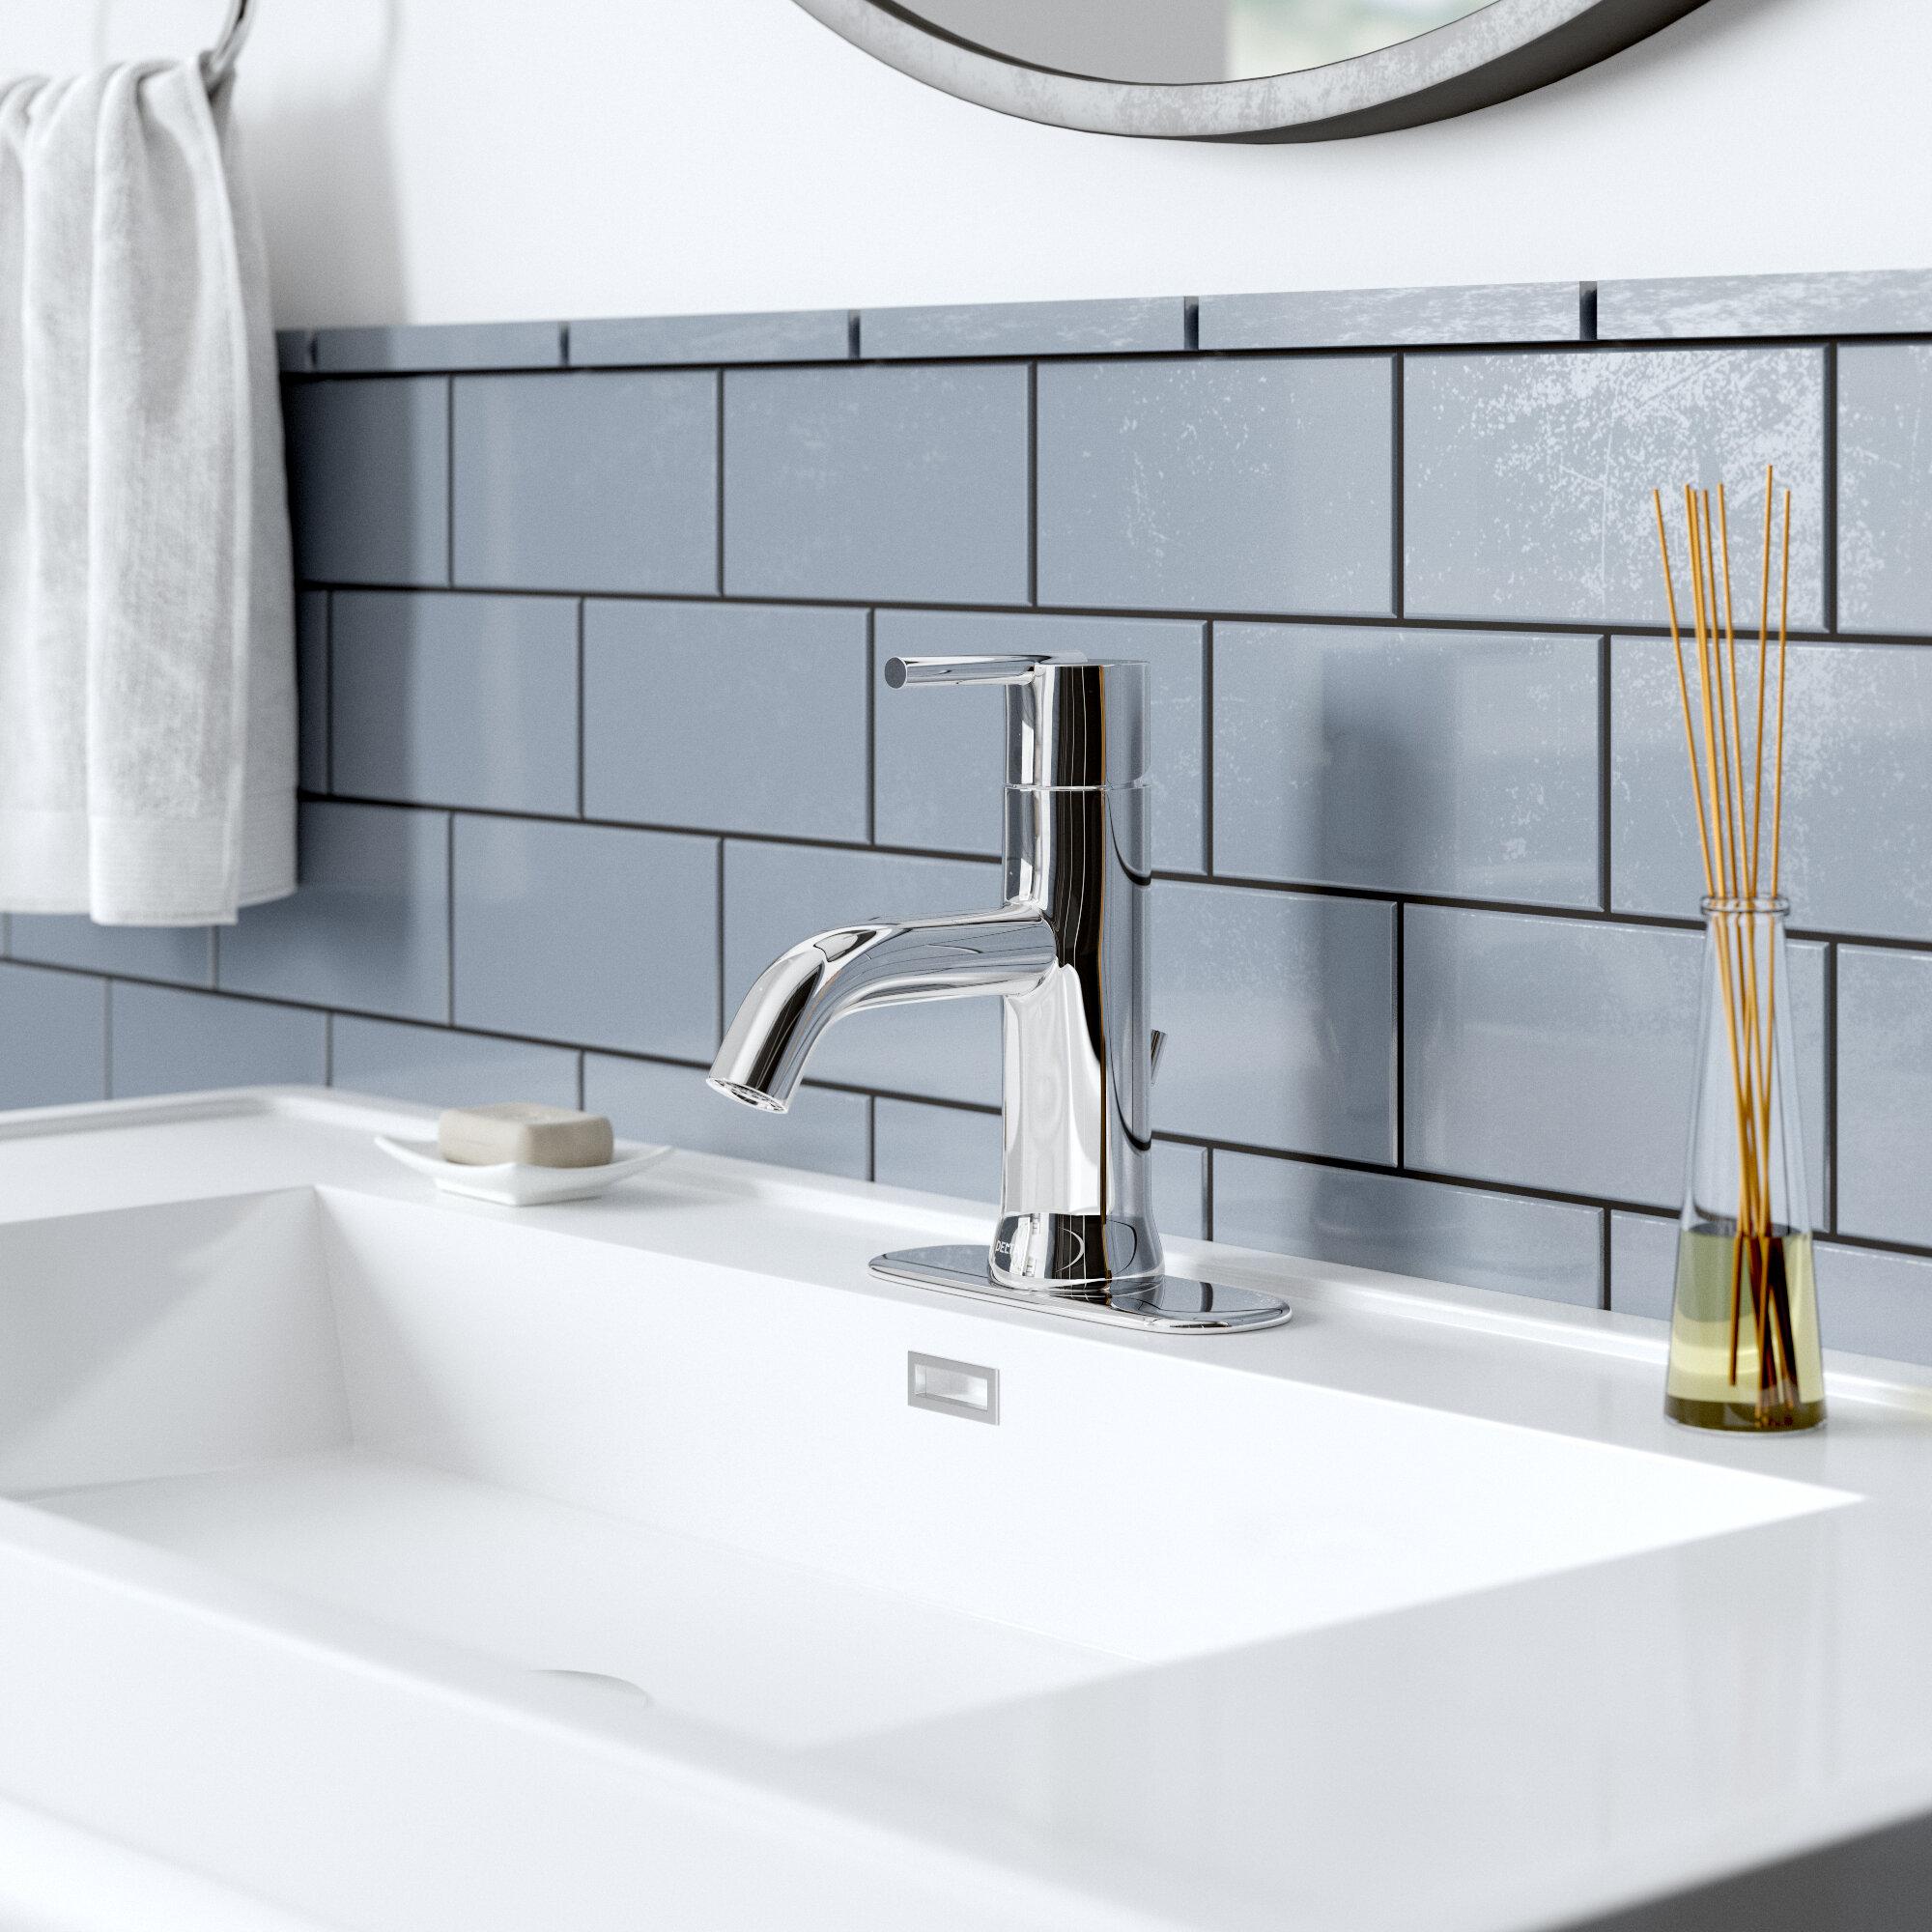 559lf Ssmpu Mpu Czmpu Delta Trinsic Single Hole Bathroom Faucet Reviews Wayfair